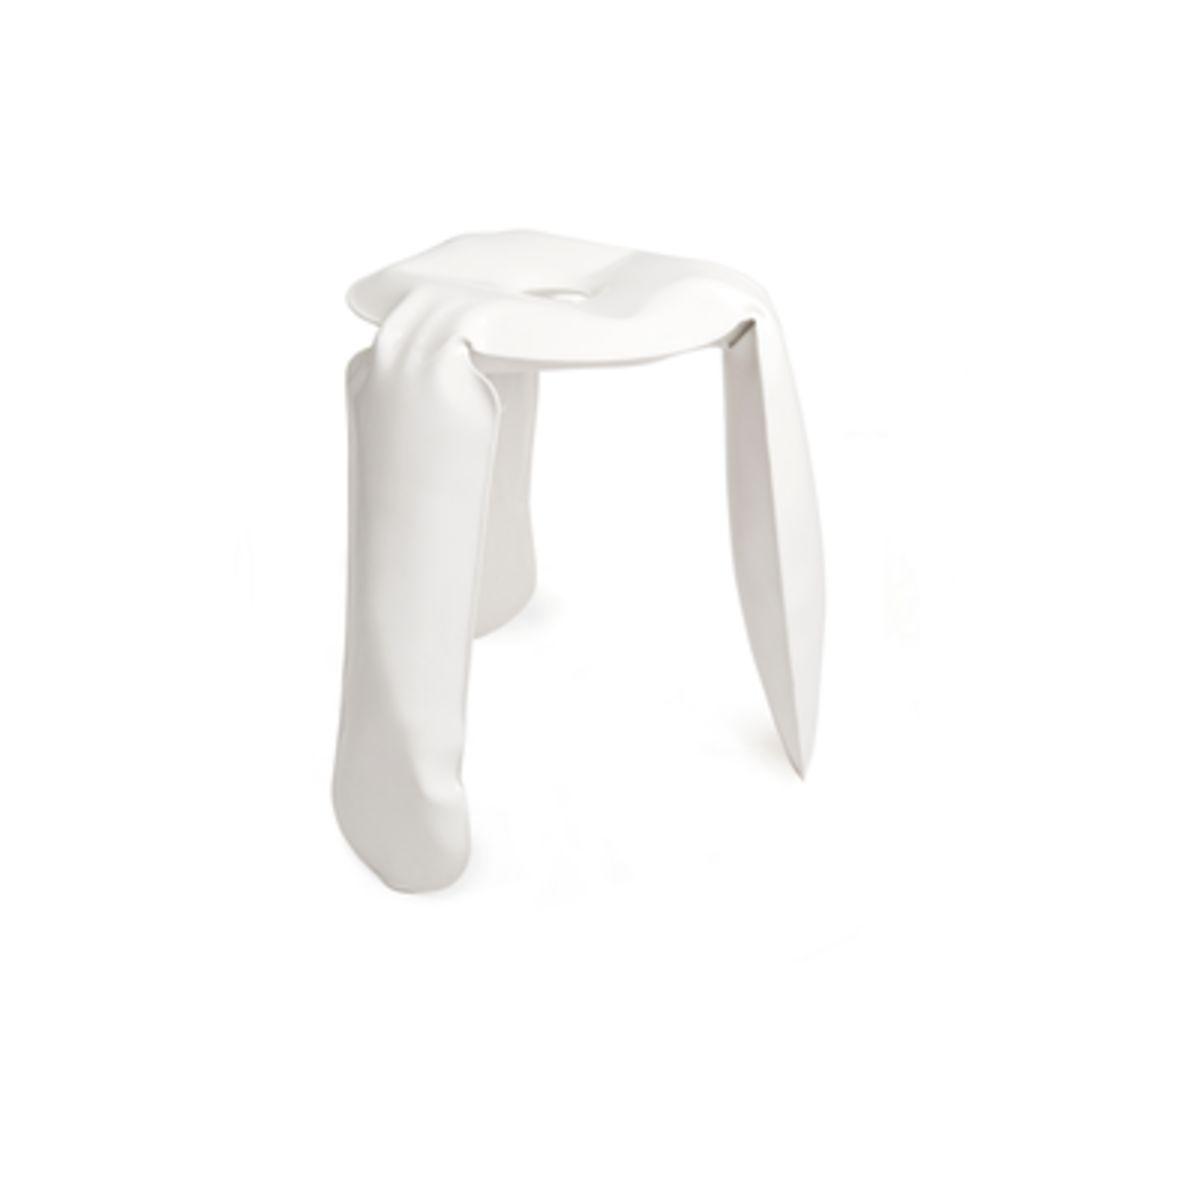 Tremendous Shop Plopp Kitchen Stool Inzonedesignstudio Interior Chair Design Inzonedesignstudiocom